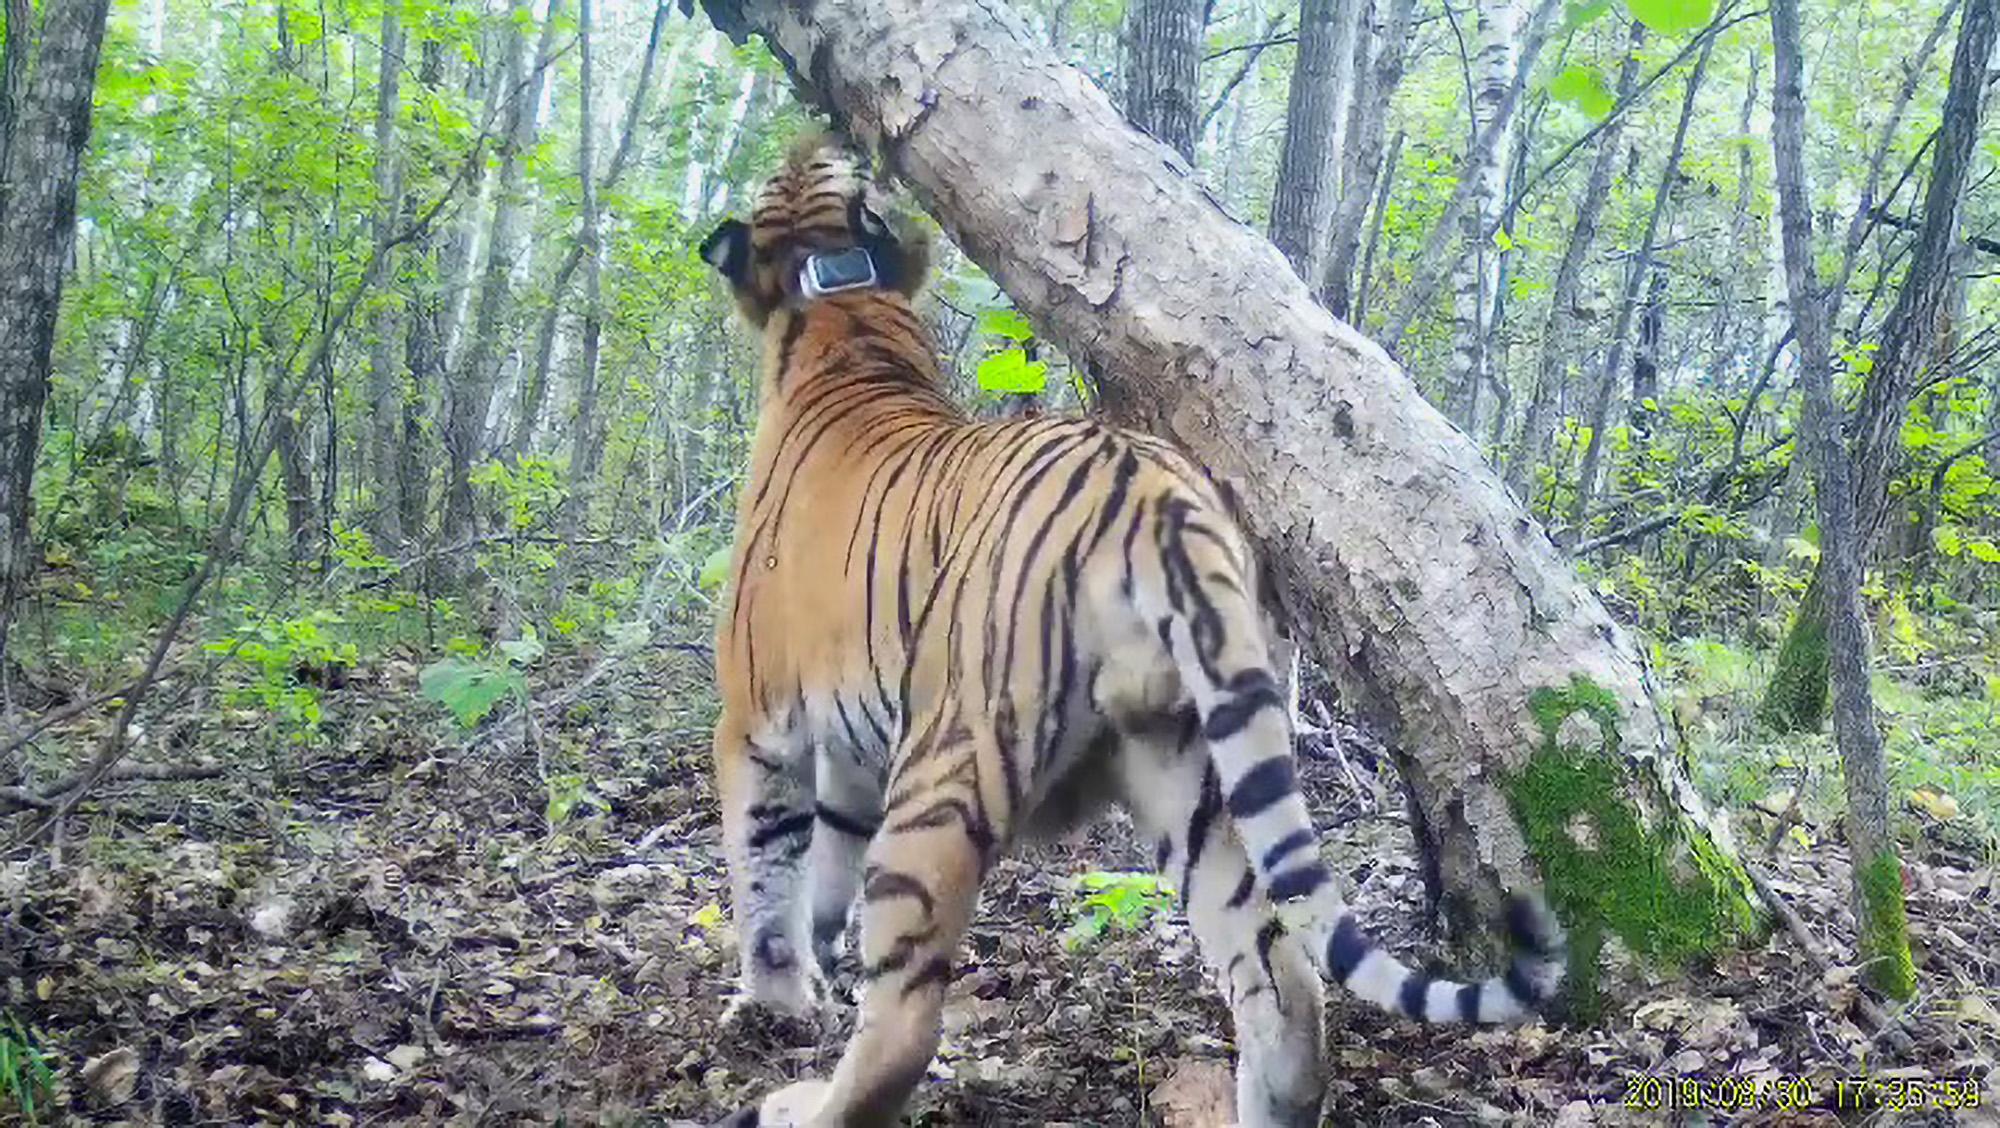 Putin's virile tiger Boris helps boost president's political status